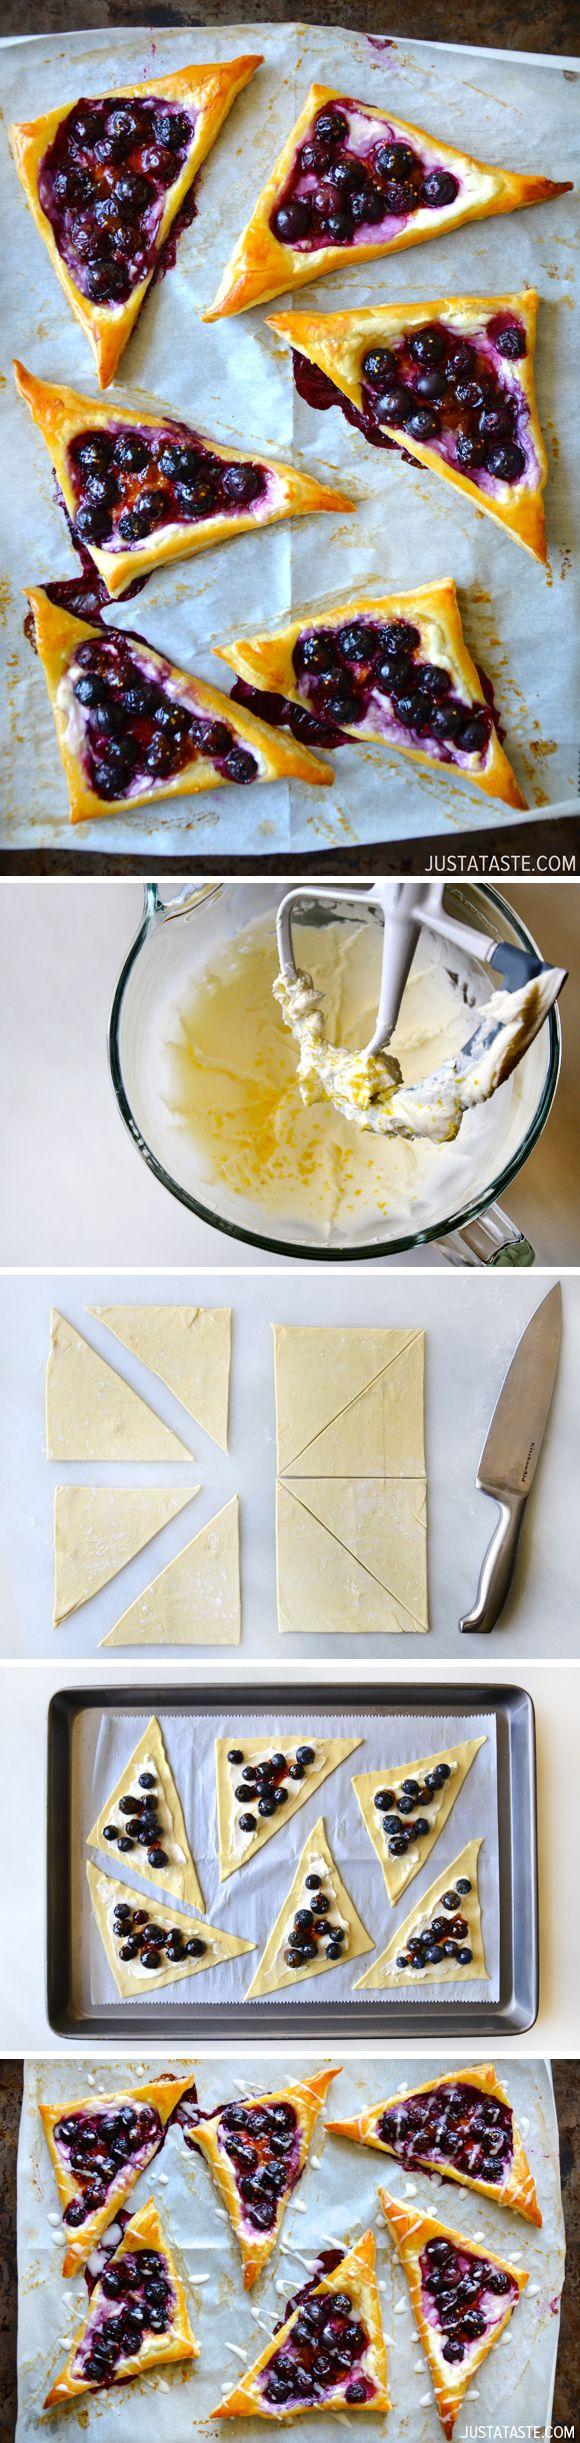 Blueberry Cream Cheese Pastries #recipe